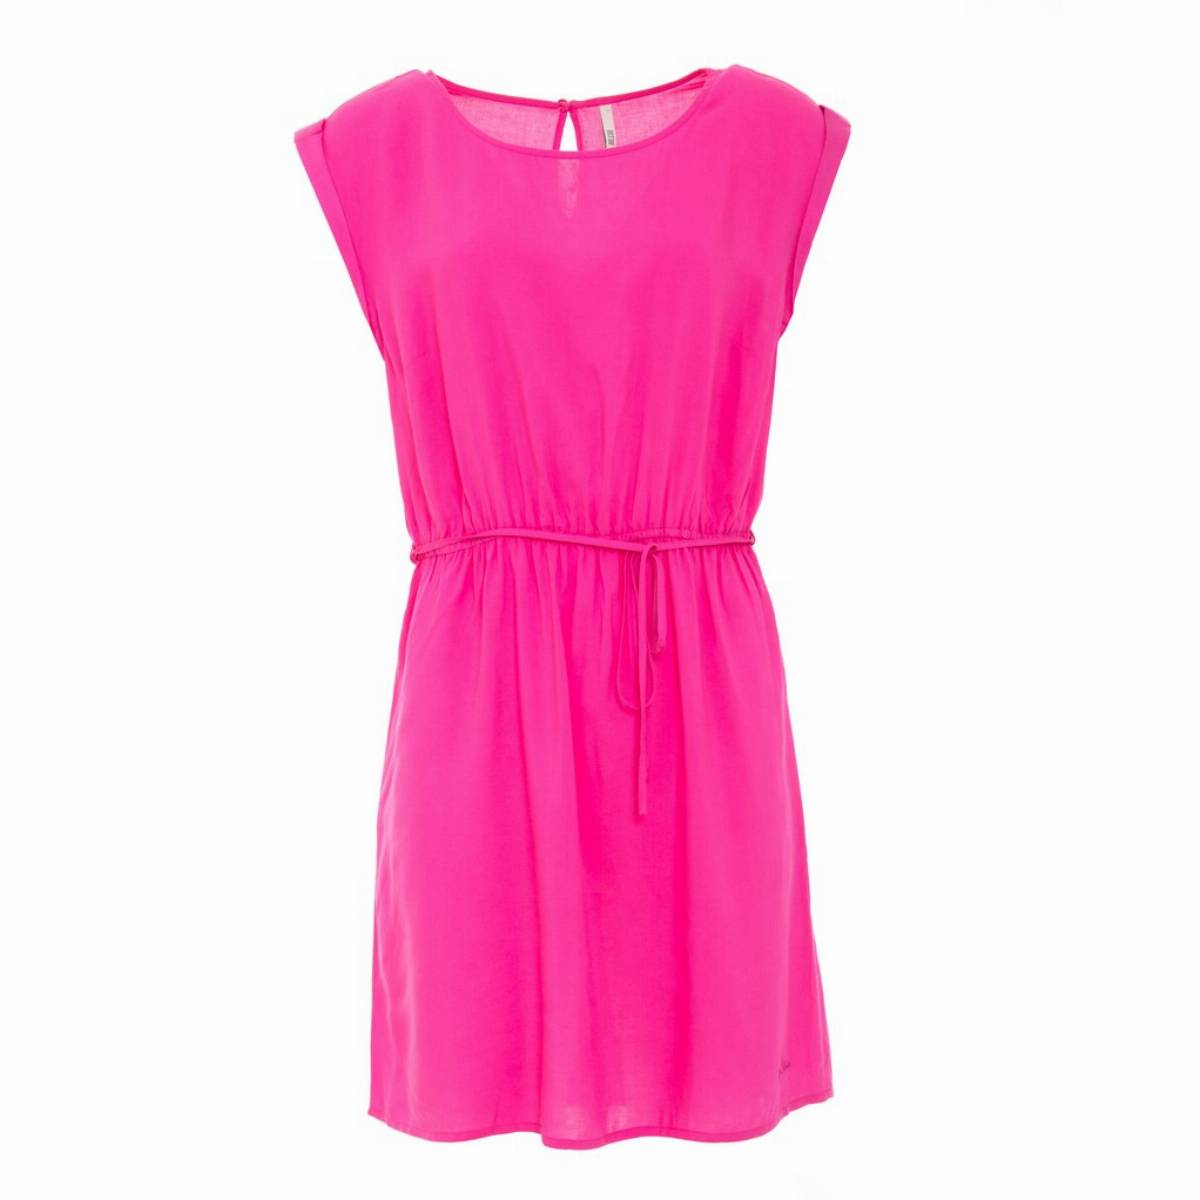 BIG_STAR_SS16_Surade_dress_658_129,90PLN